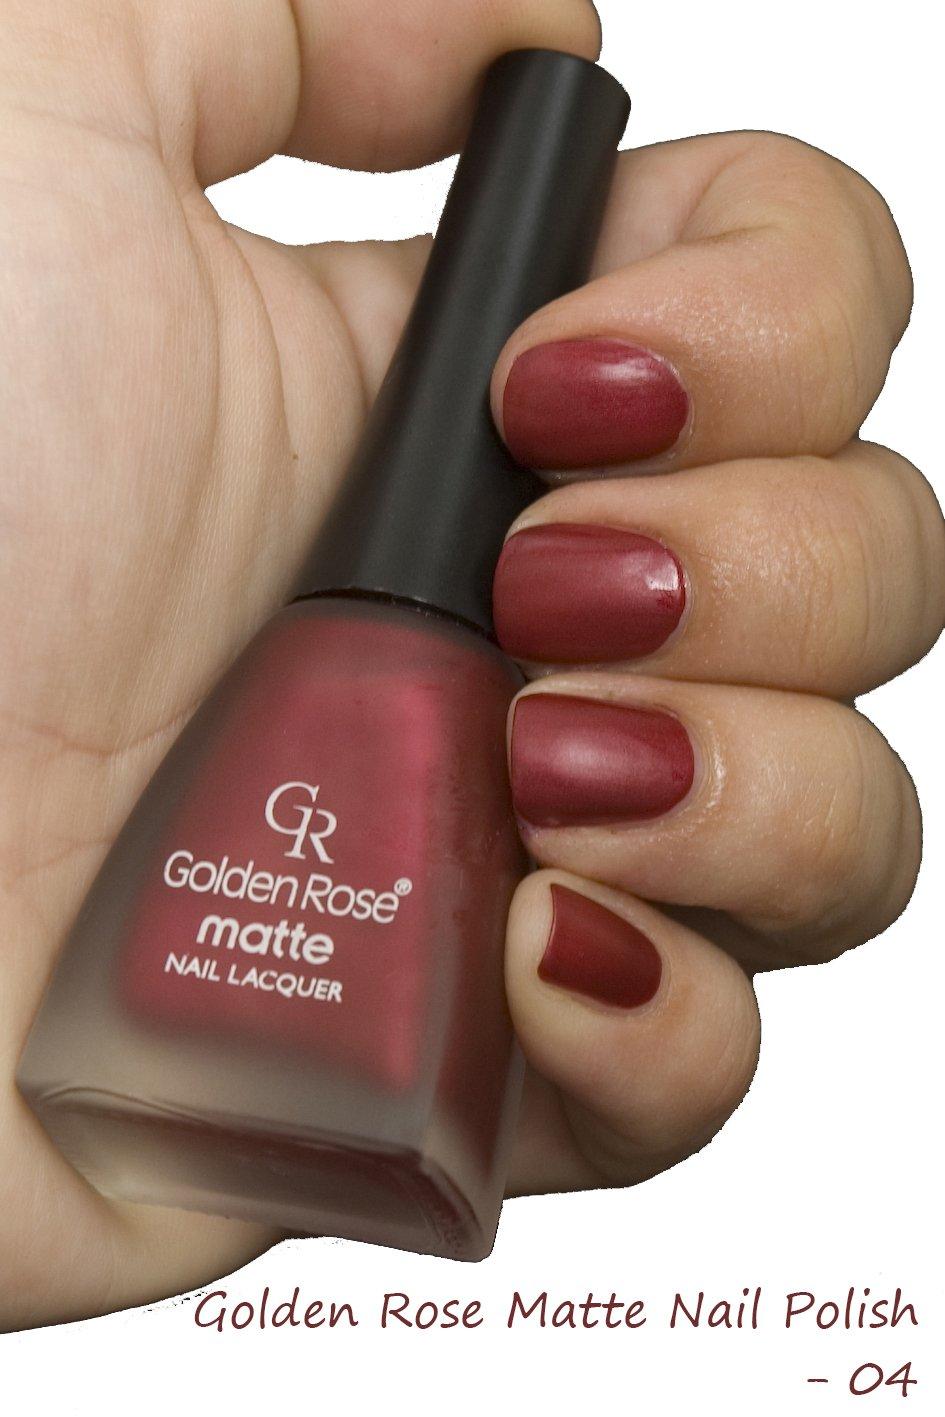 Amazon.com : Golden Rose Matte Nail Polish - 04 Jazzberry Jam : Beauty